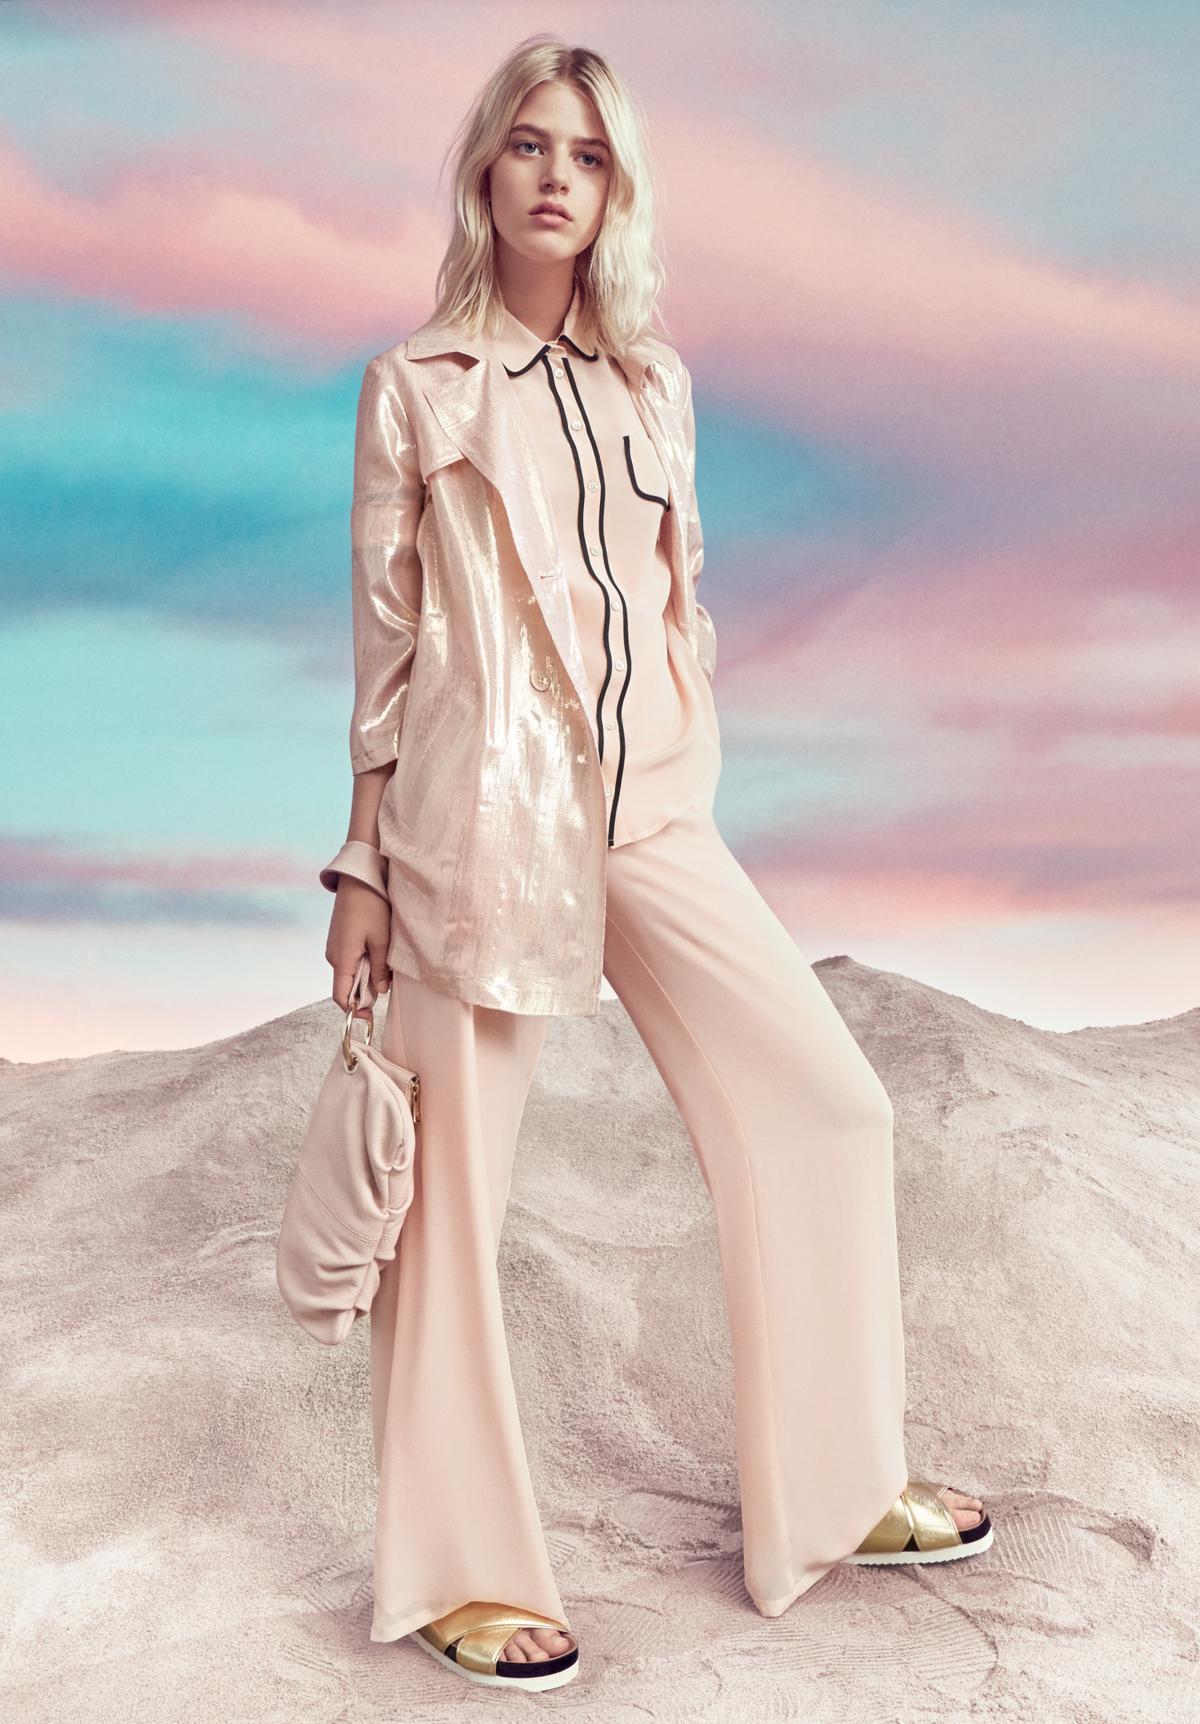 lowest price cd705 7ac68 Milano Fashion Week: Patrizia Pepe presenta la nuova ...